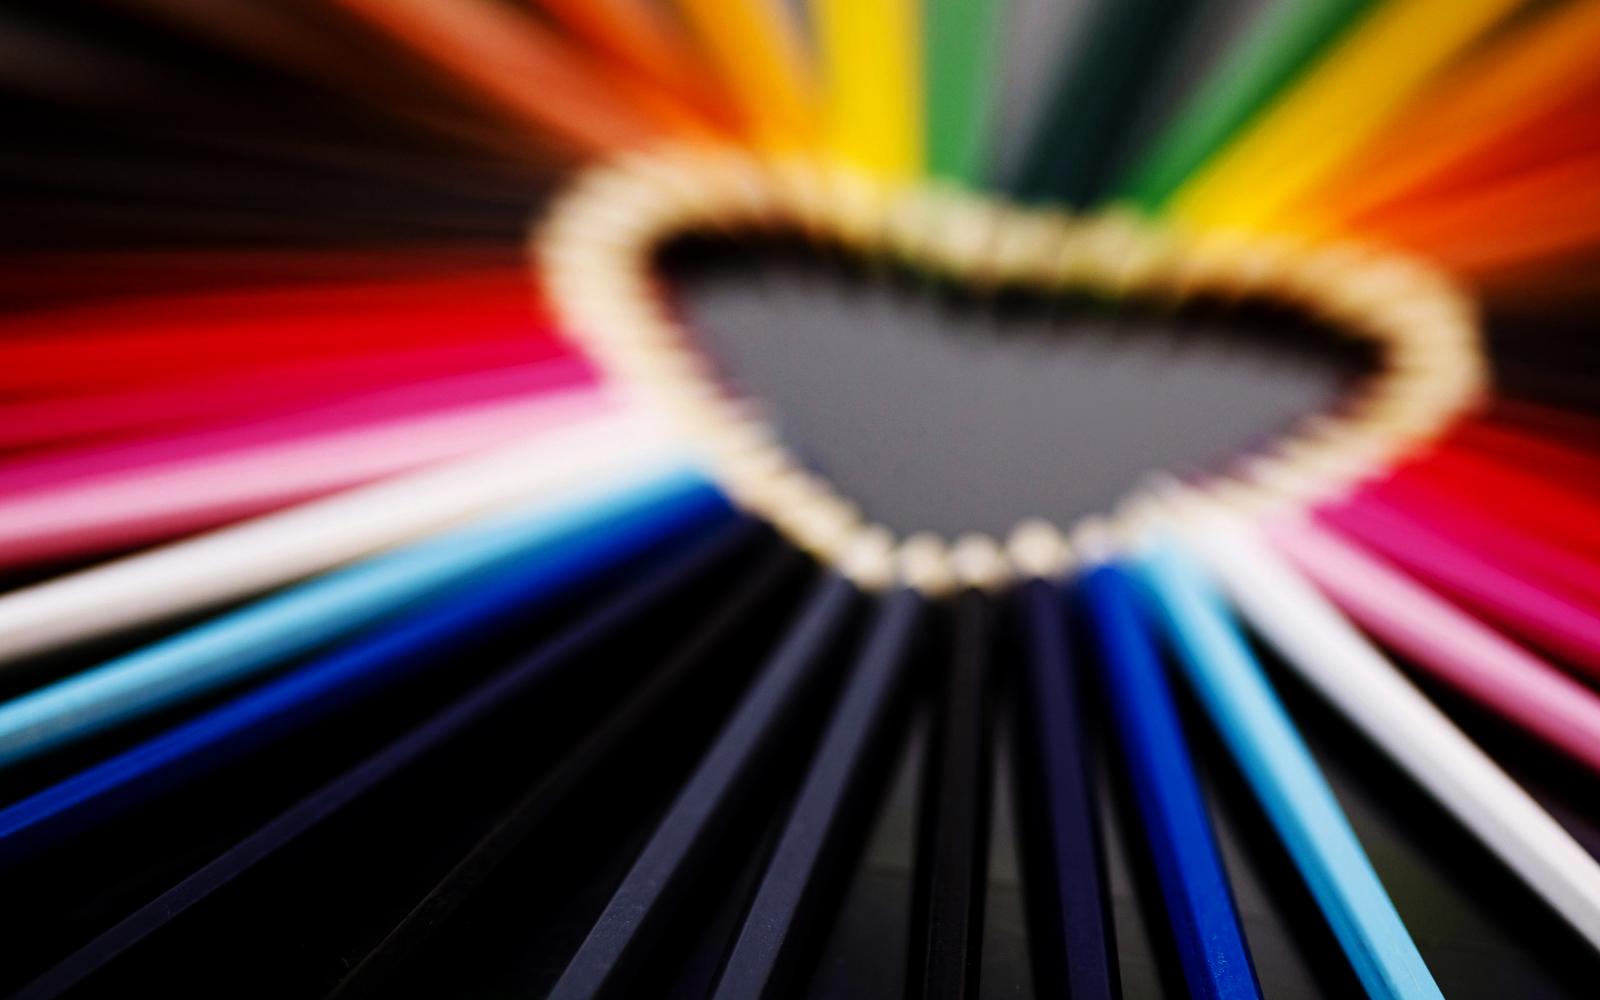 http://1.bp.blogspot.com/-BZAwWSXHLCg/T0DKYkgeYFI/AAAAAAAAArA/27uoepl-T7A/s1600/Heart_Shape_with_Color_Pencil_HD_Wallpaper-Vvallpaper.Net.jpg